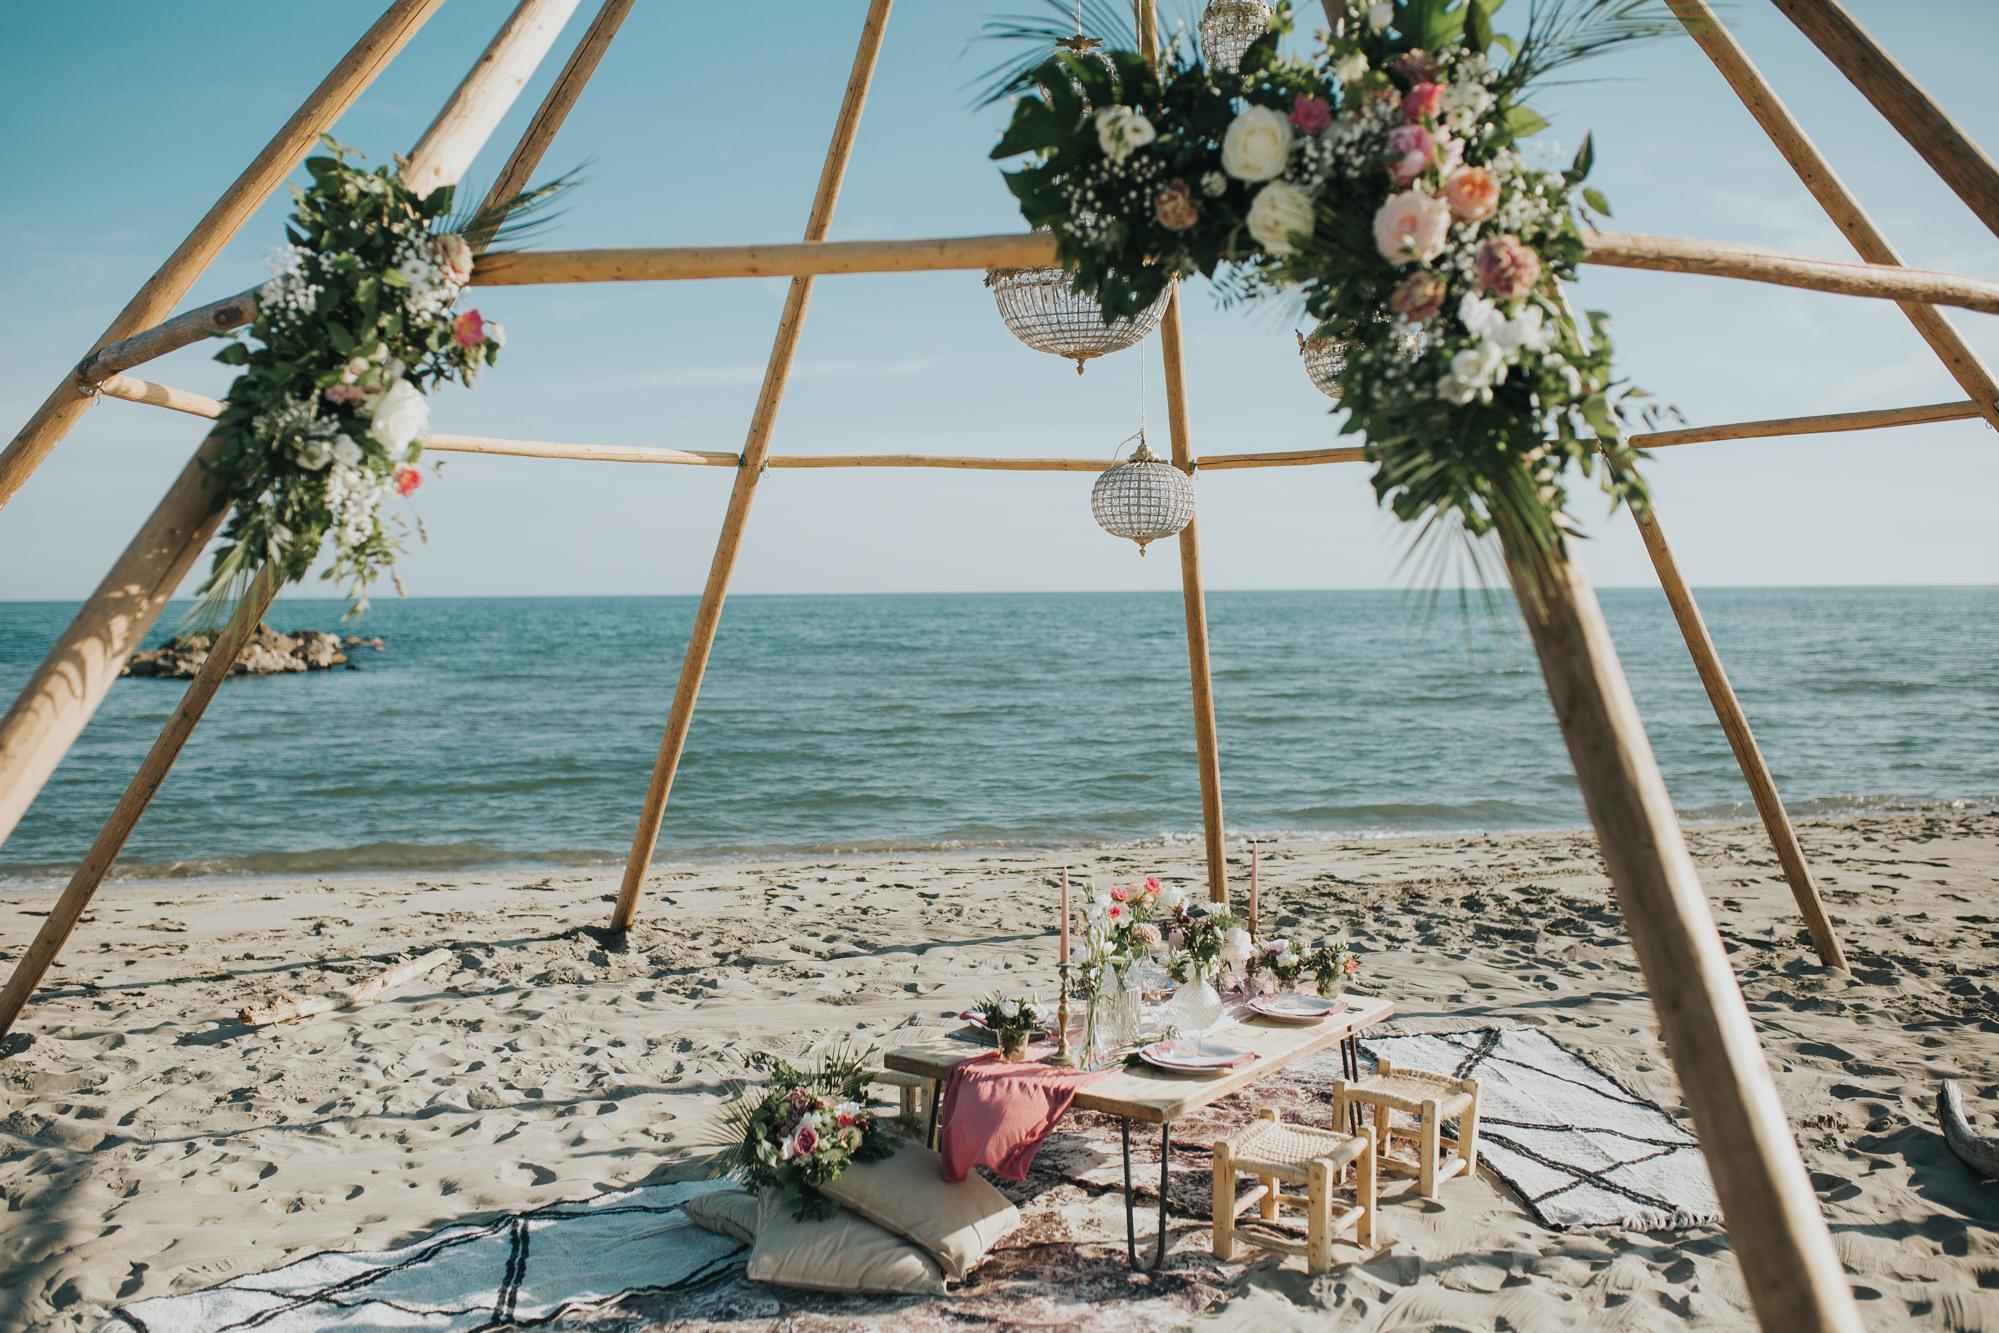 melaniebultez-folk-wedding-photographer-tipi-provence-197.jpg